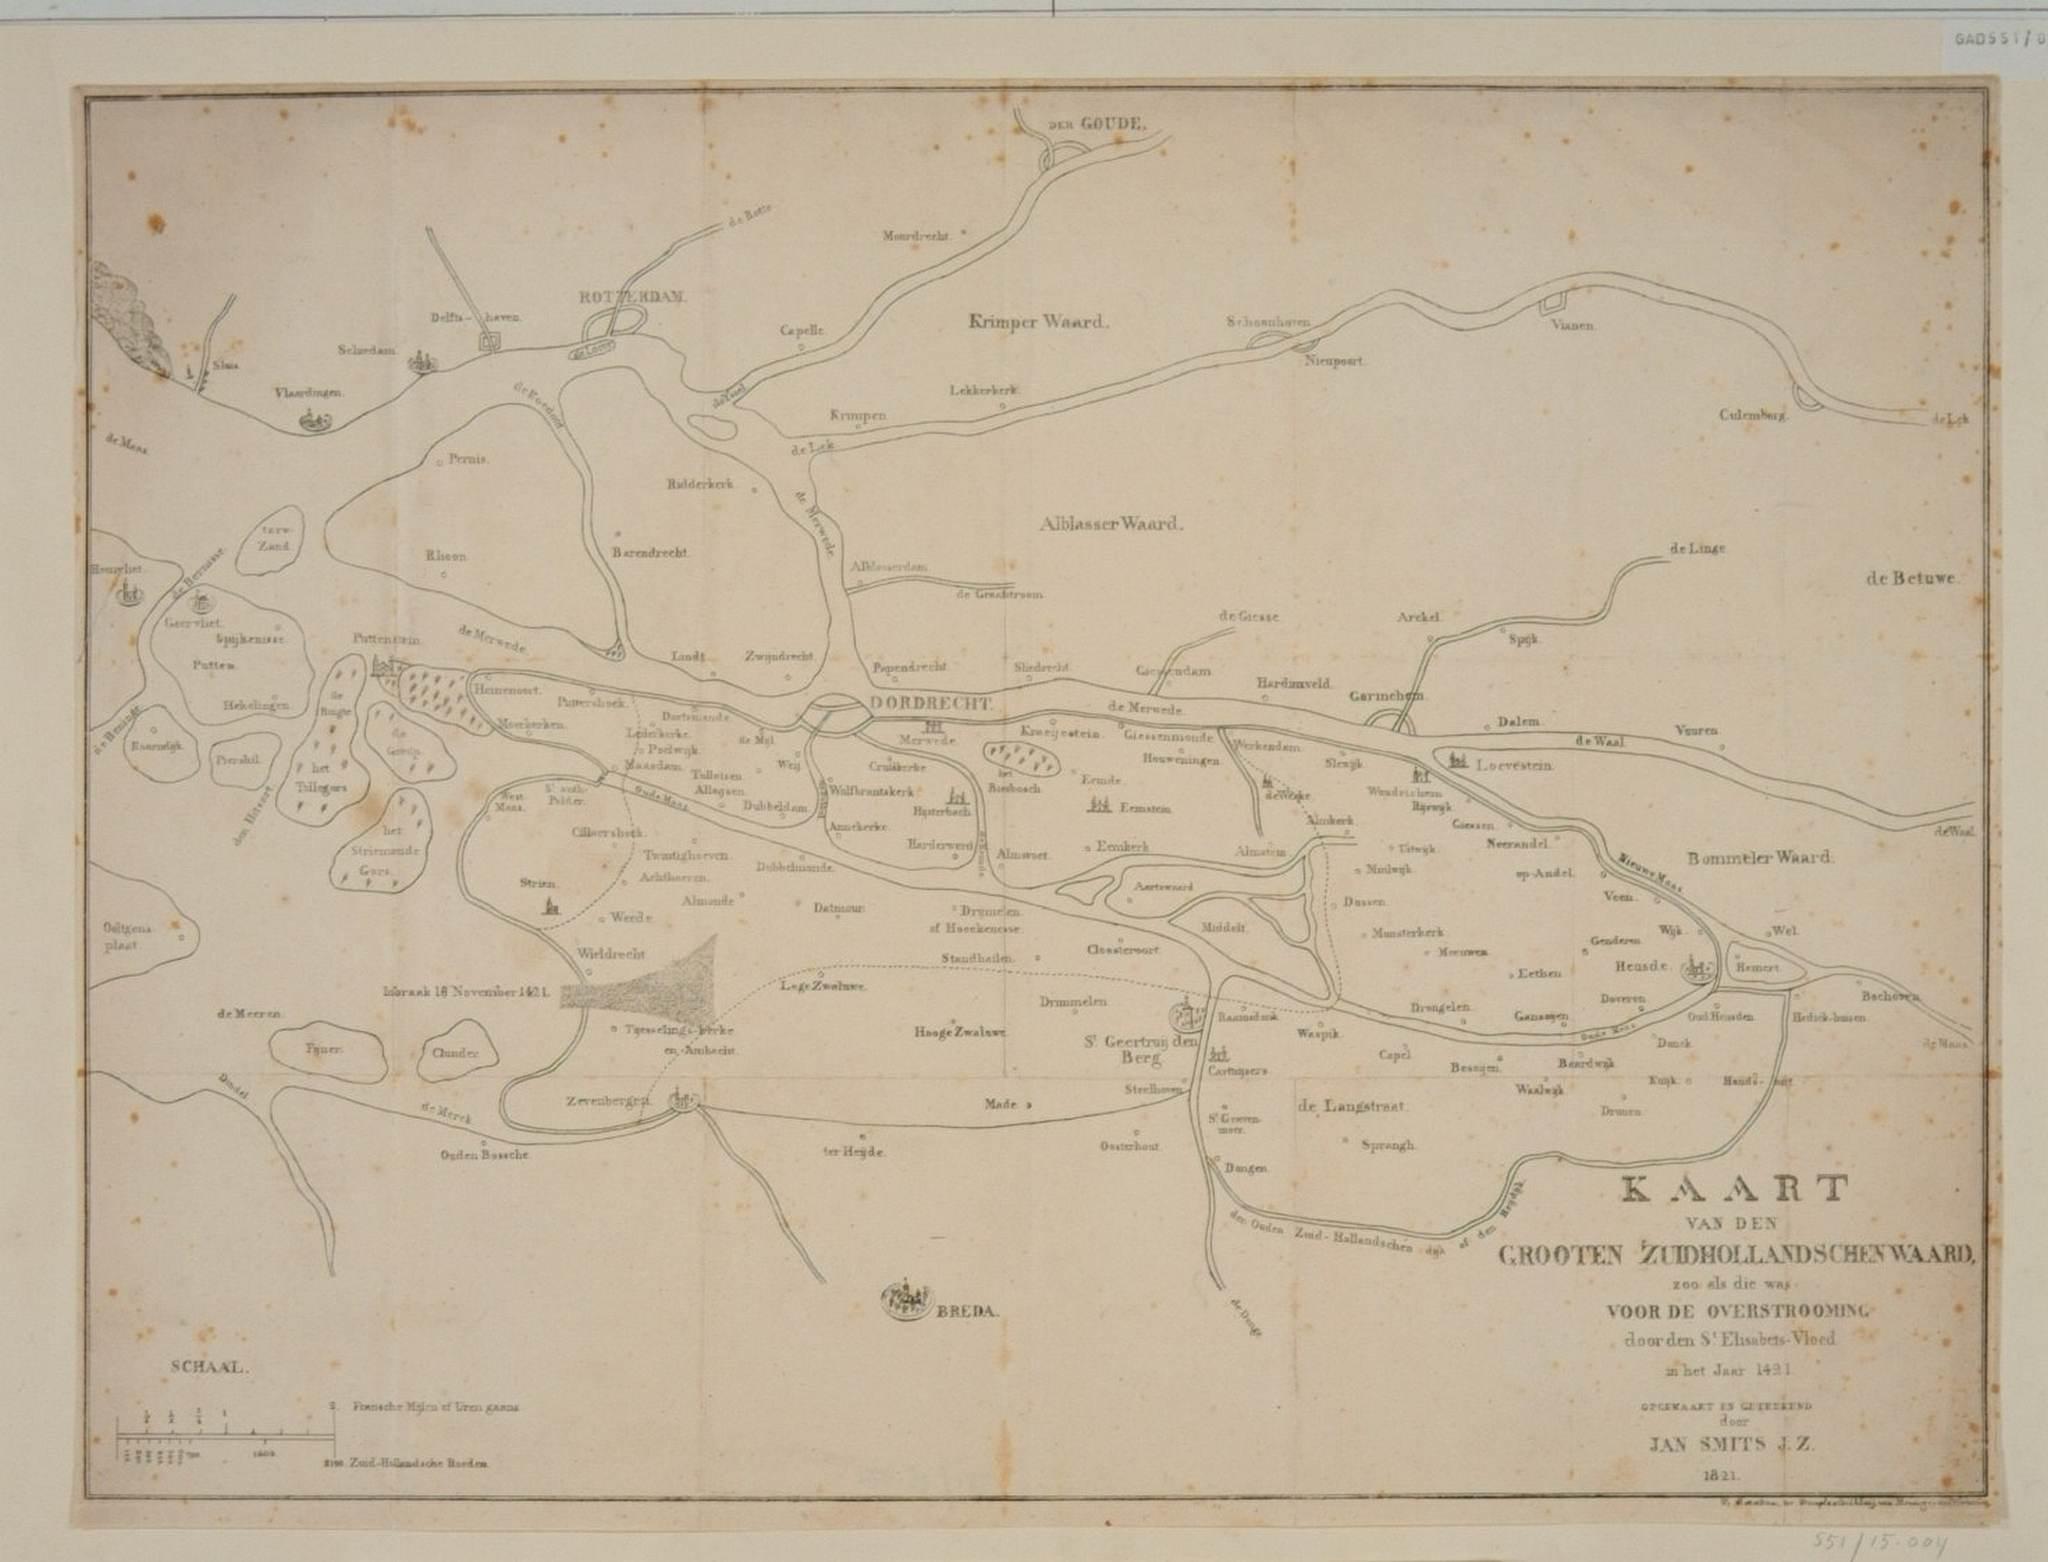 Kaart voor Sint Elisabethsvloed 2